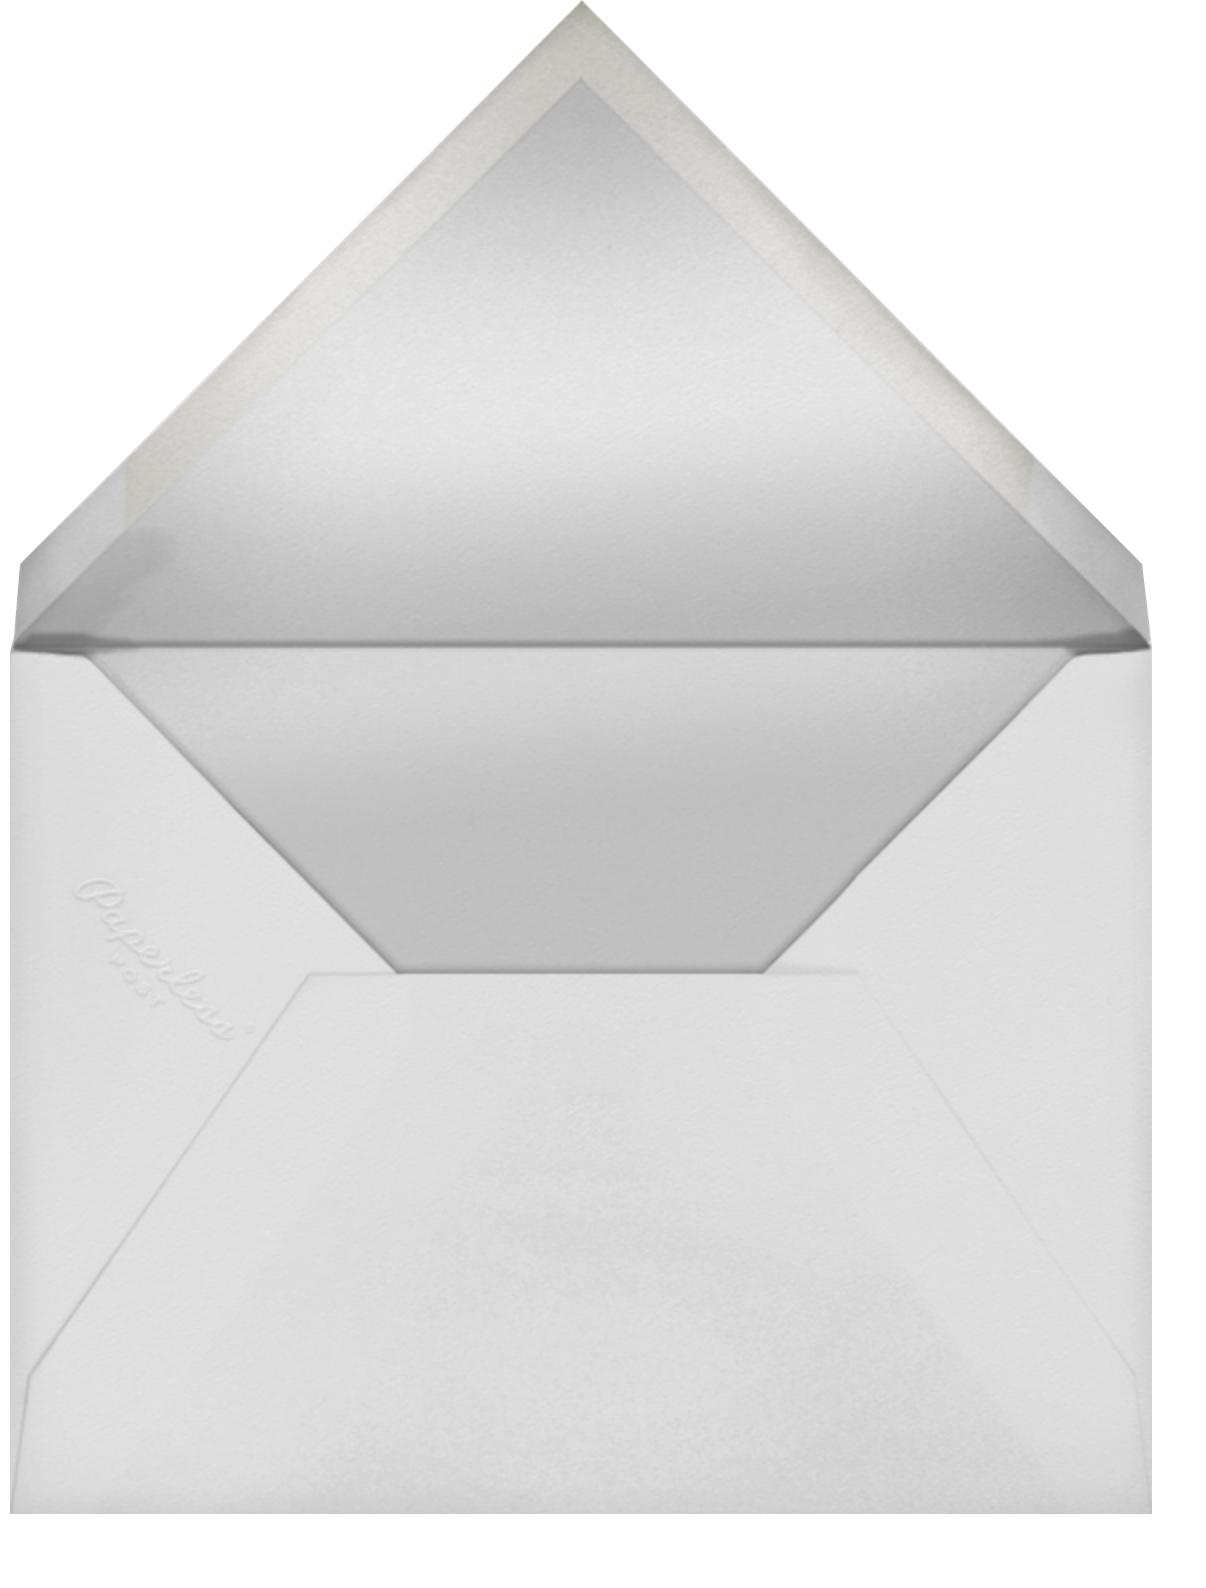 Emblem (Program) - Flame - Bernard Maisner - Menus and programs - envelope back